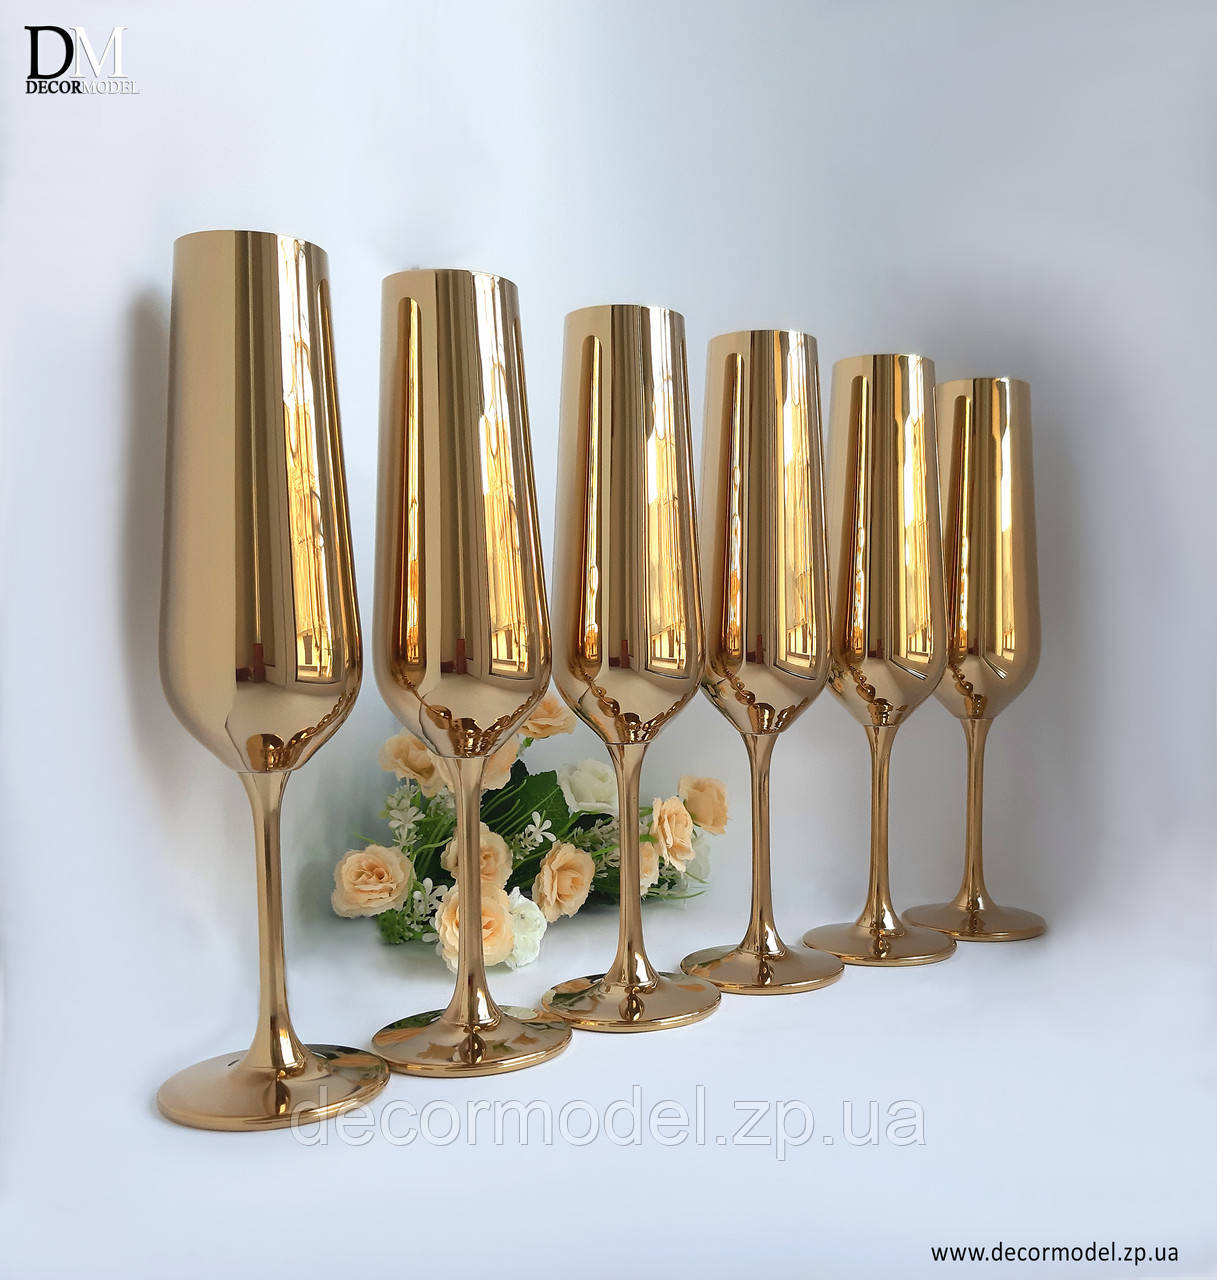 Набор бокалов для шампанского Bohemia Strix 200 ml (цвет: ЗОЛОТО)